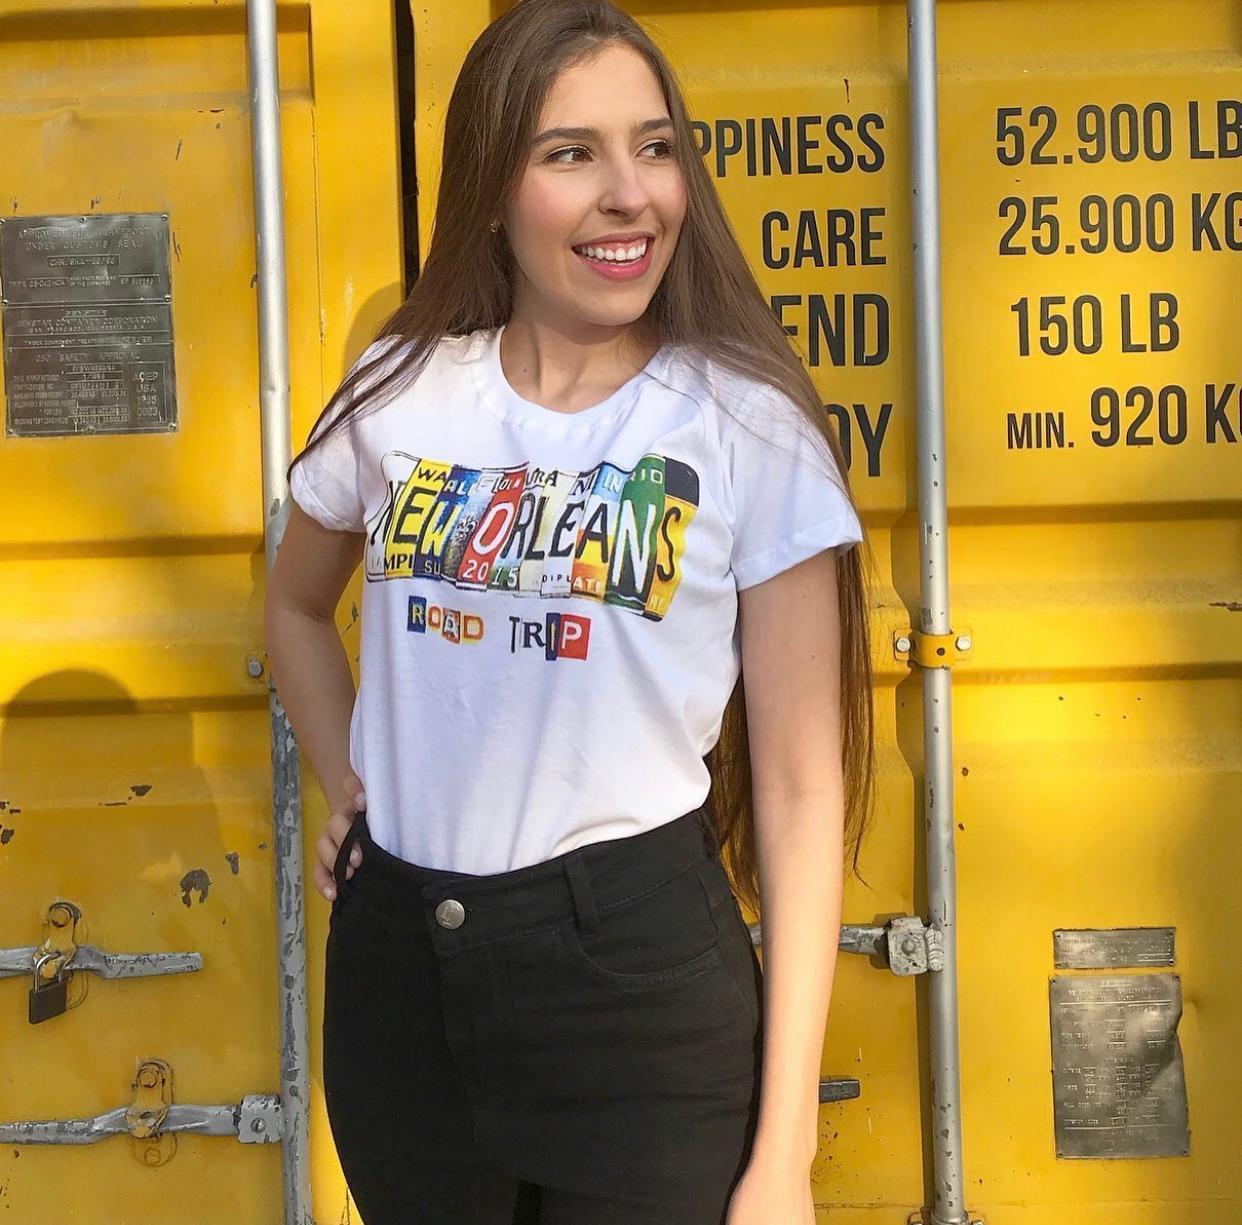 Blusa T-Shirt Branca Estampa Placa New Orleans Florê